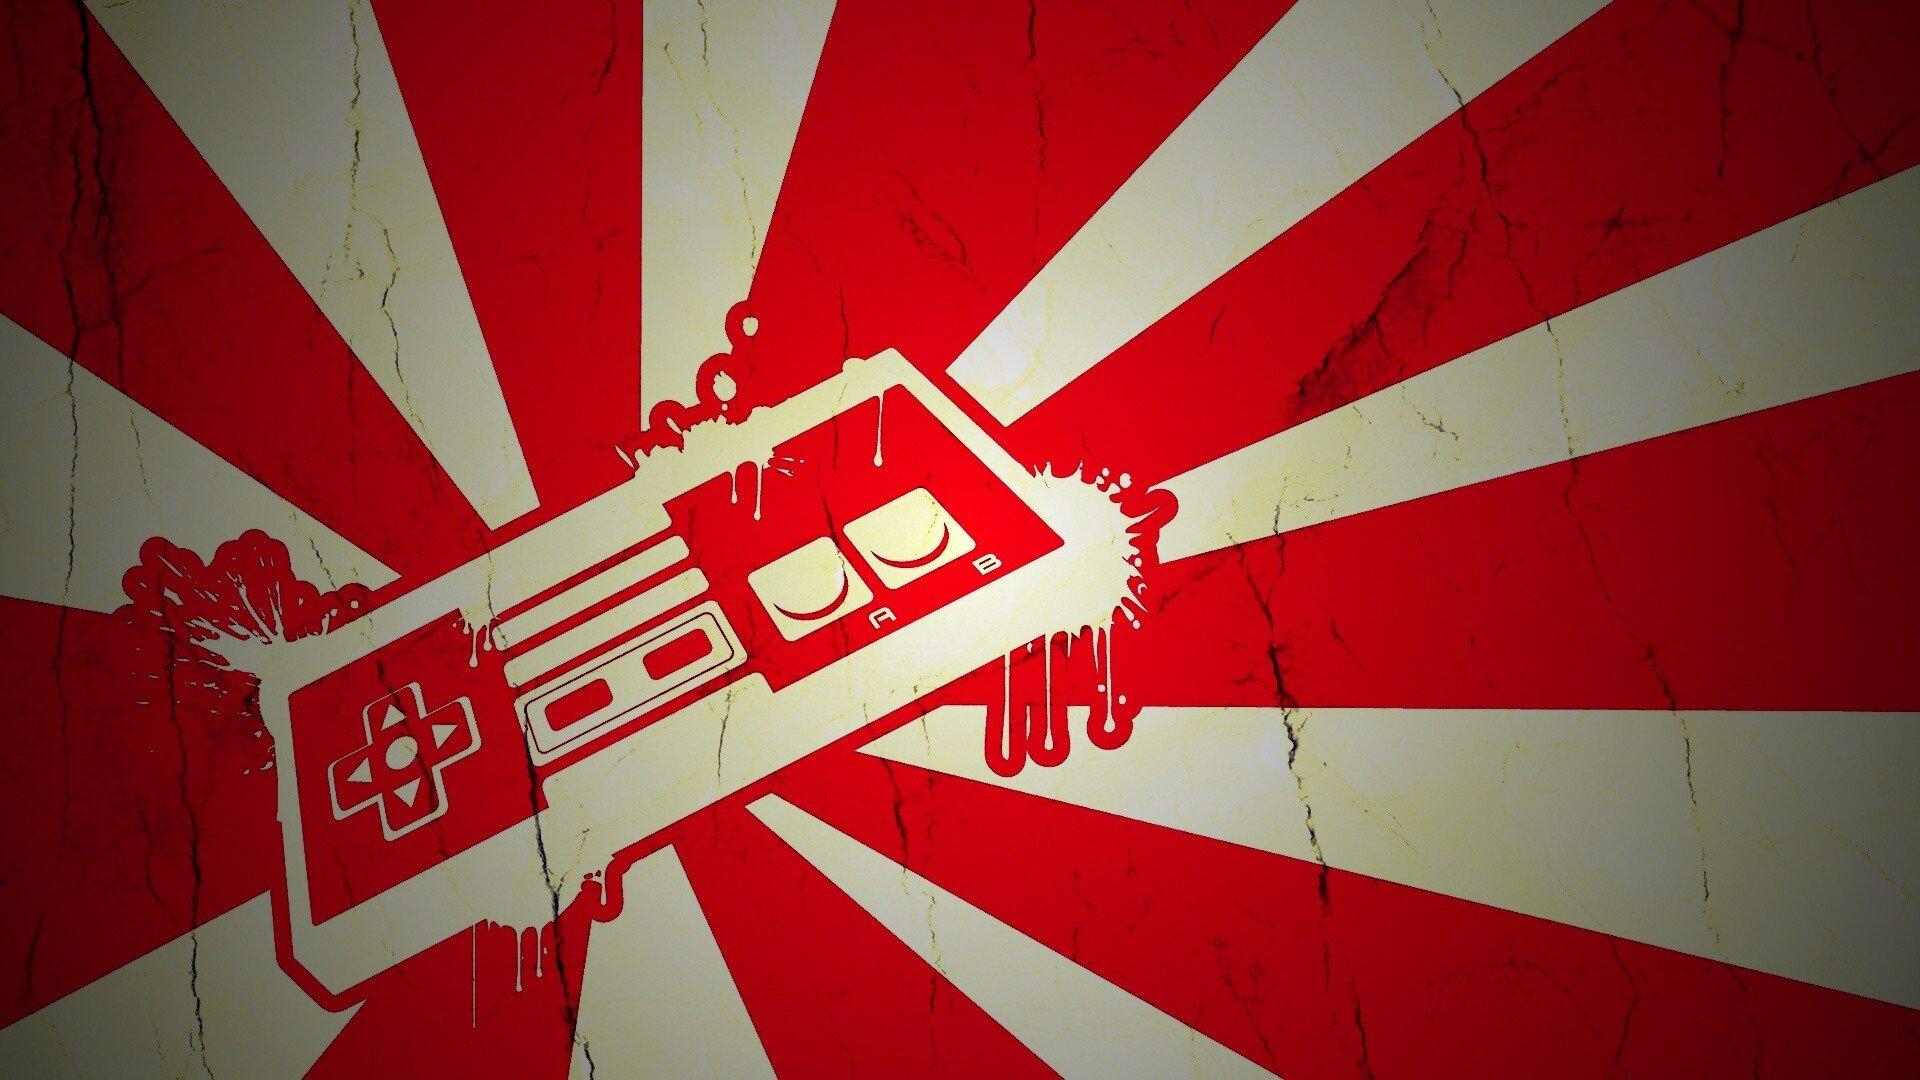 Retro Gaming 1920x1080 wallpaper